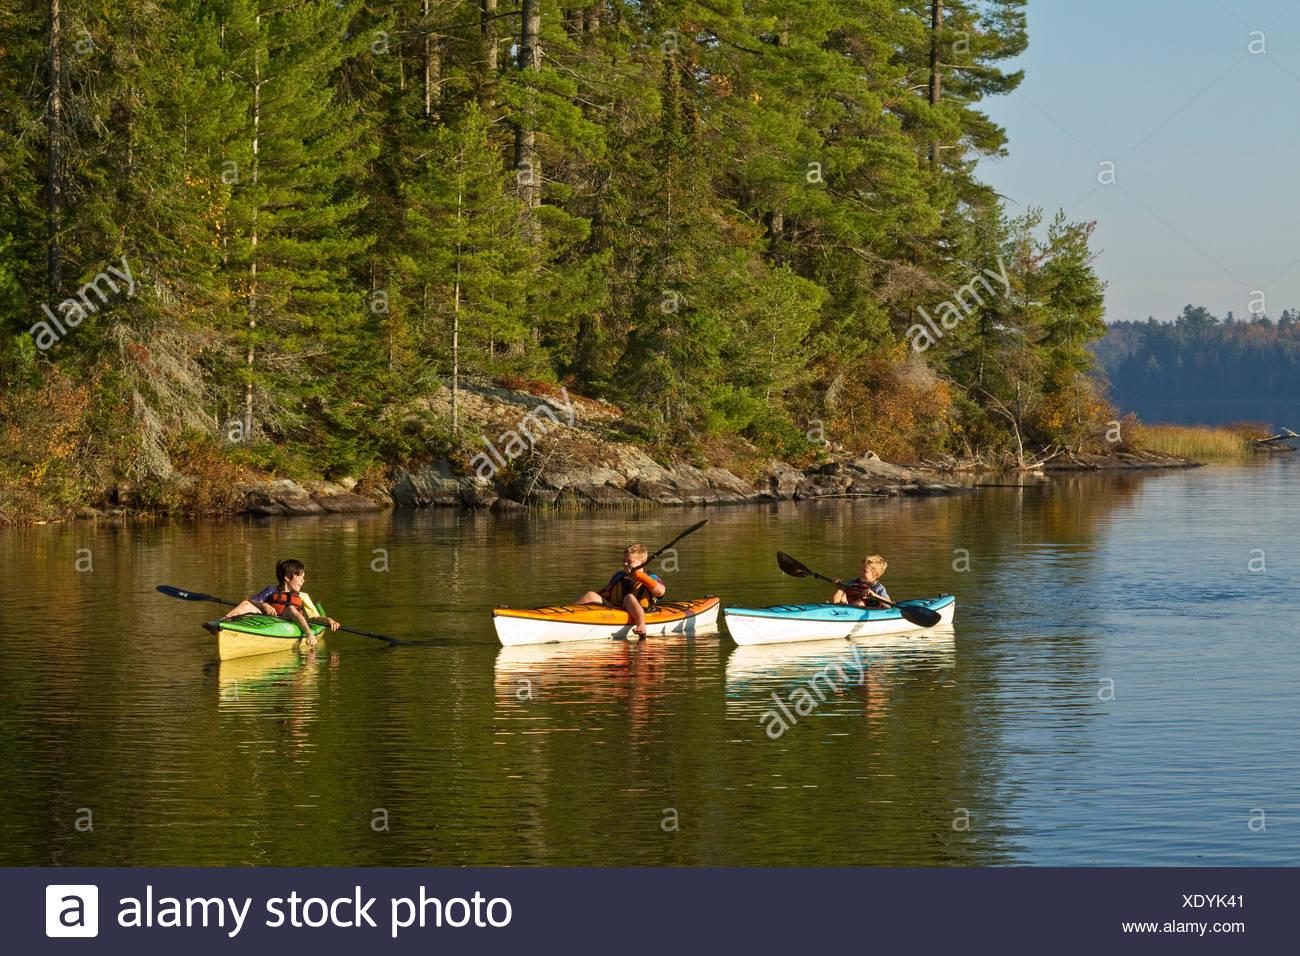 Tre giovani ragazzi paddle kayak sul lago di origine, Algonquin Park ,Ontario, Canada. Immagini Stock